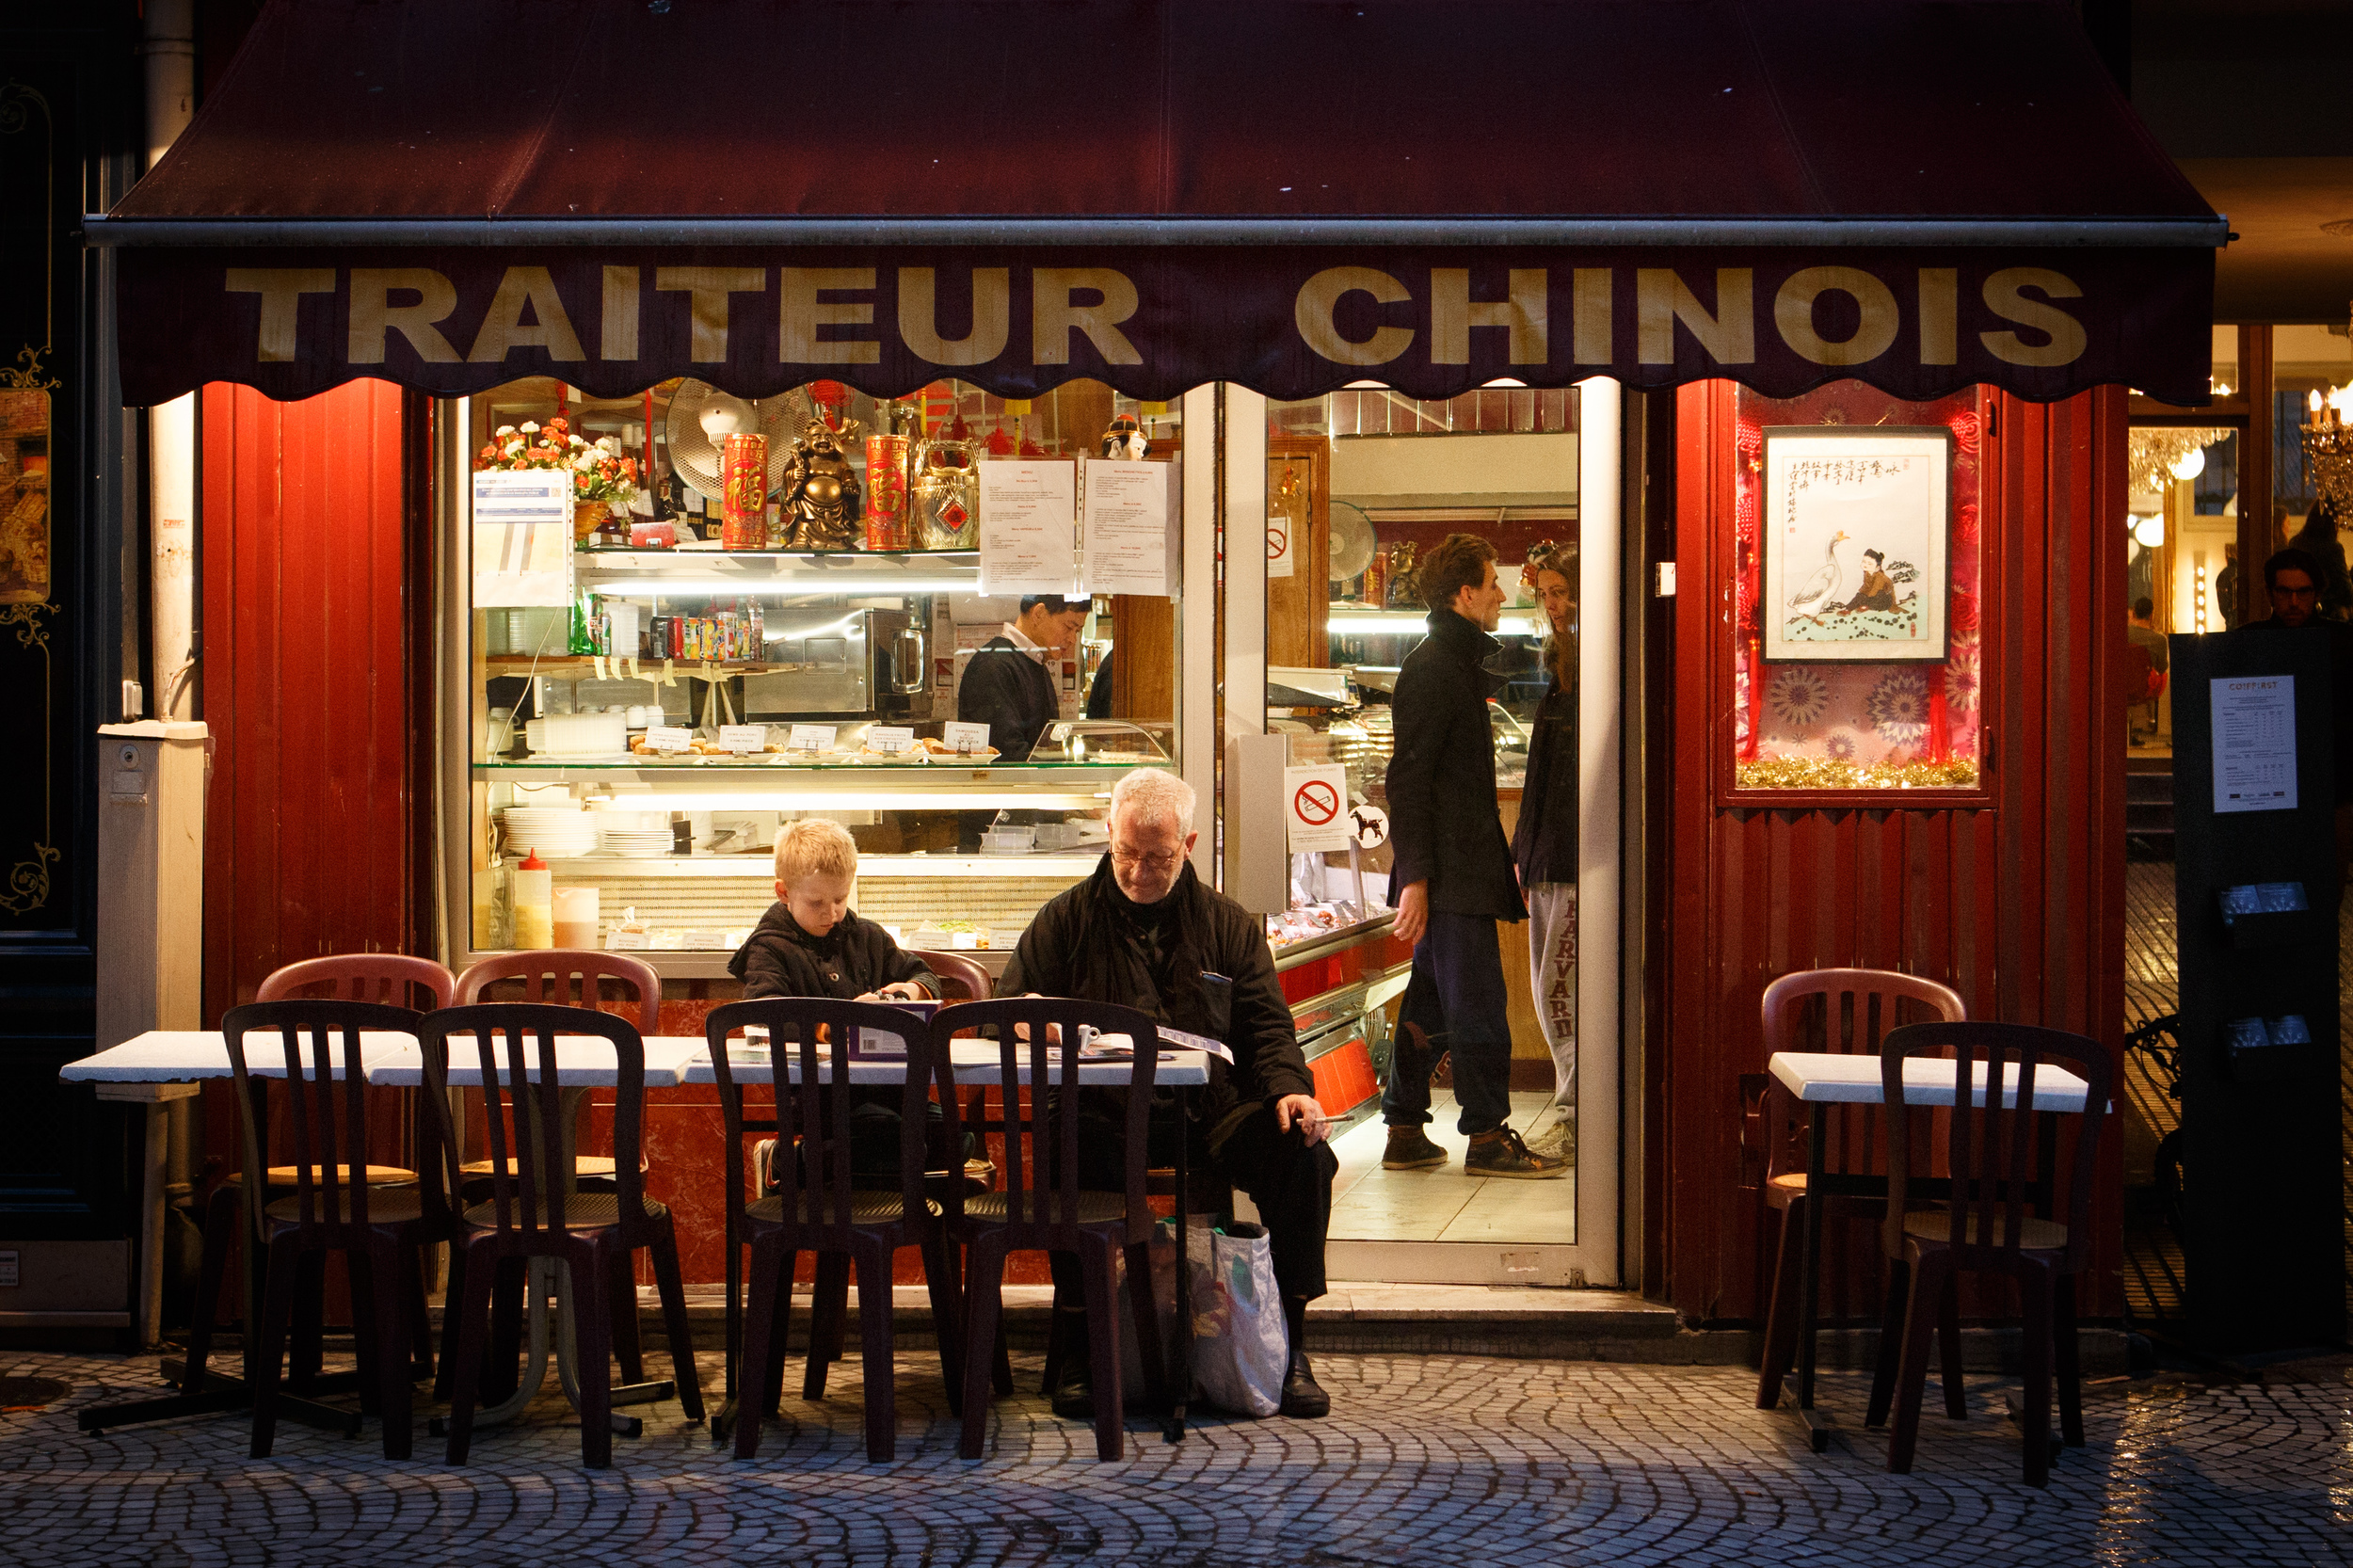 paris-2013 - 20131101 - 0958.jpg